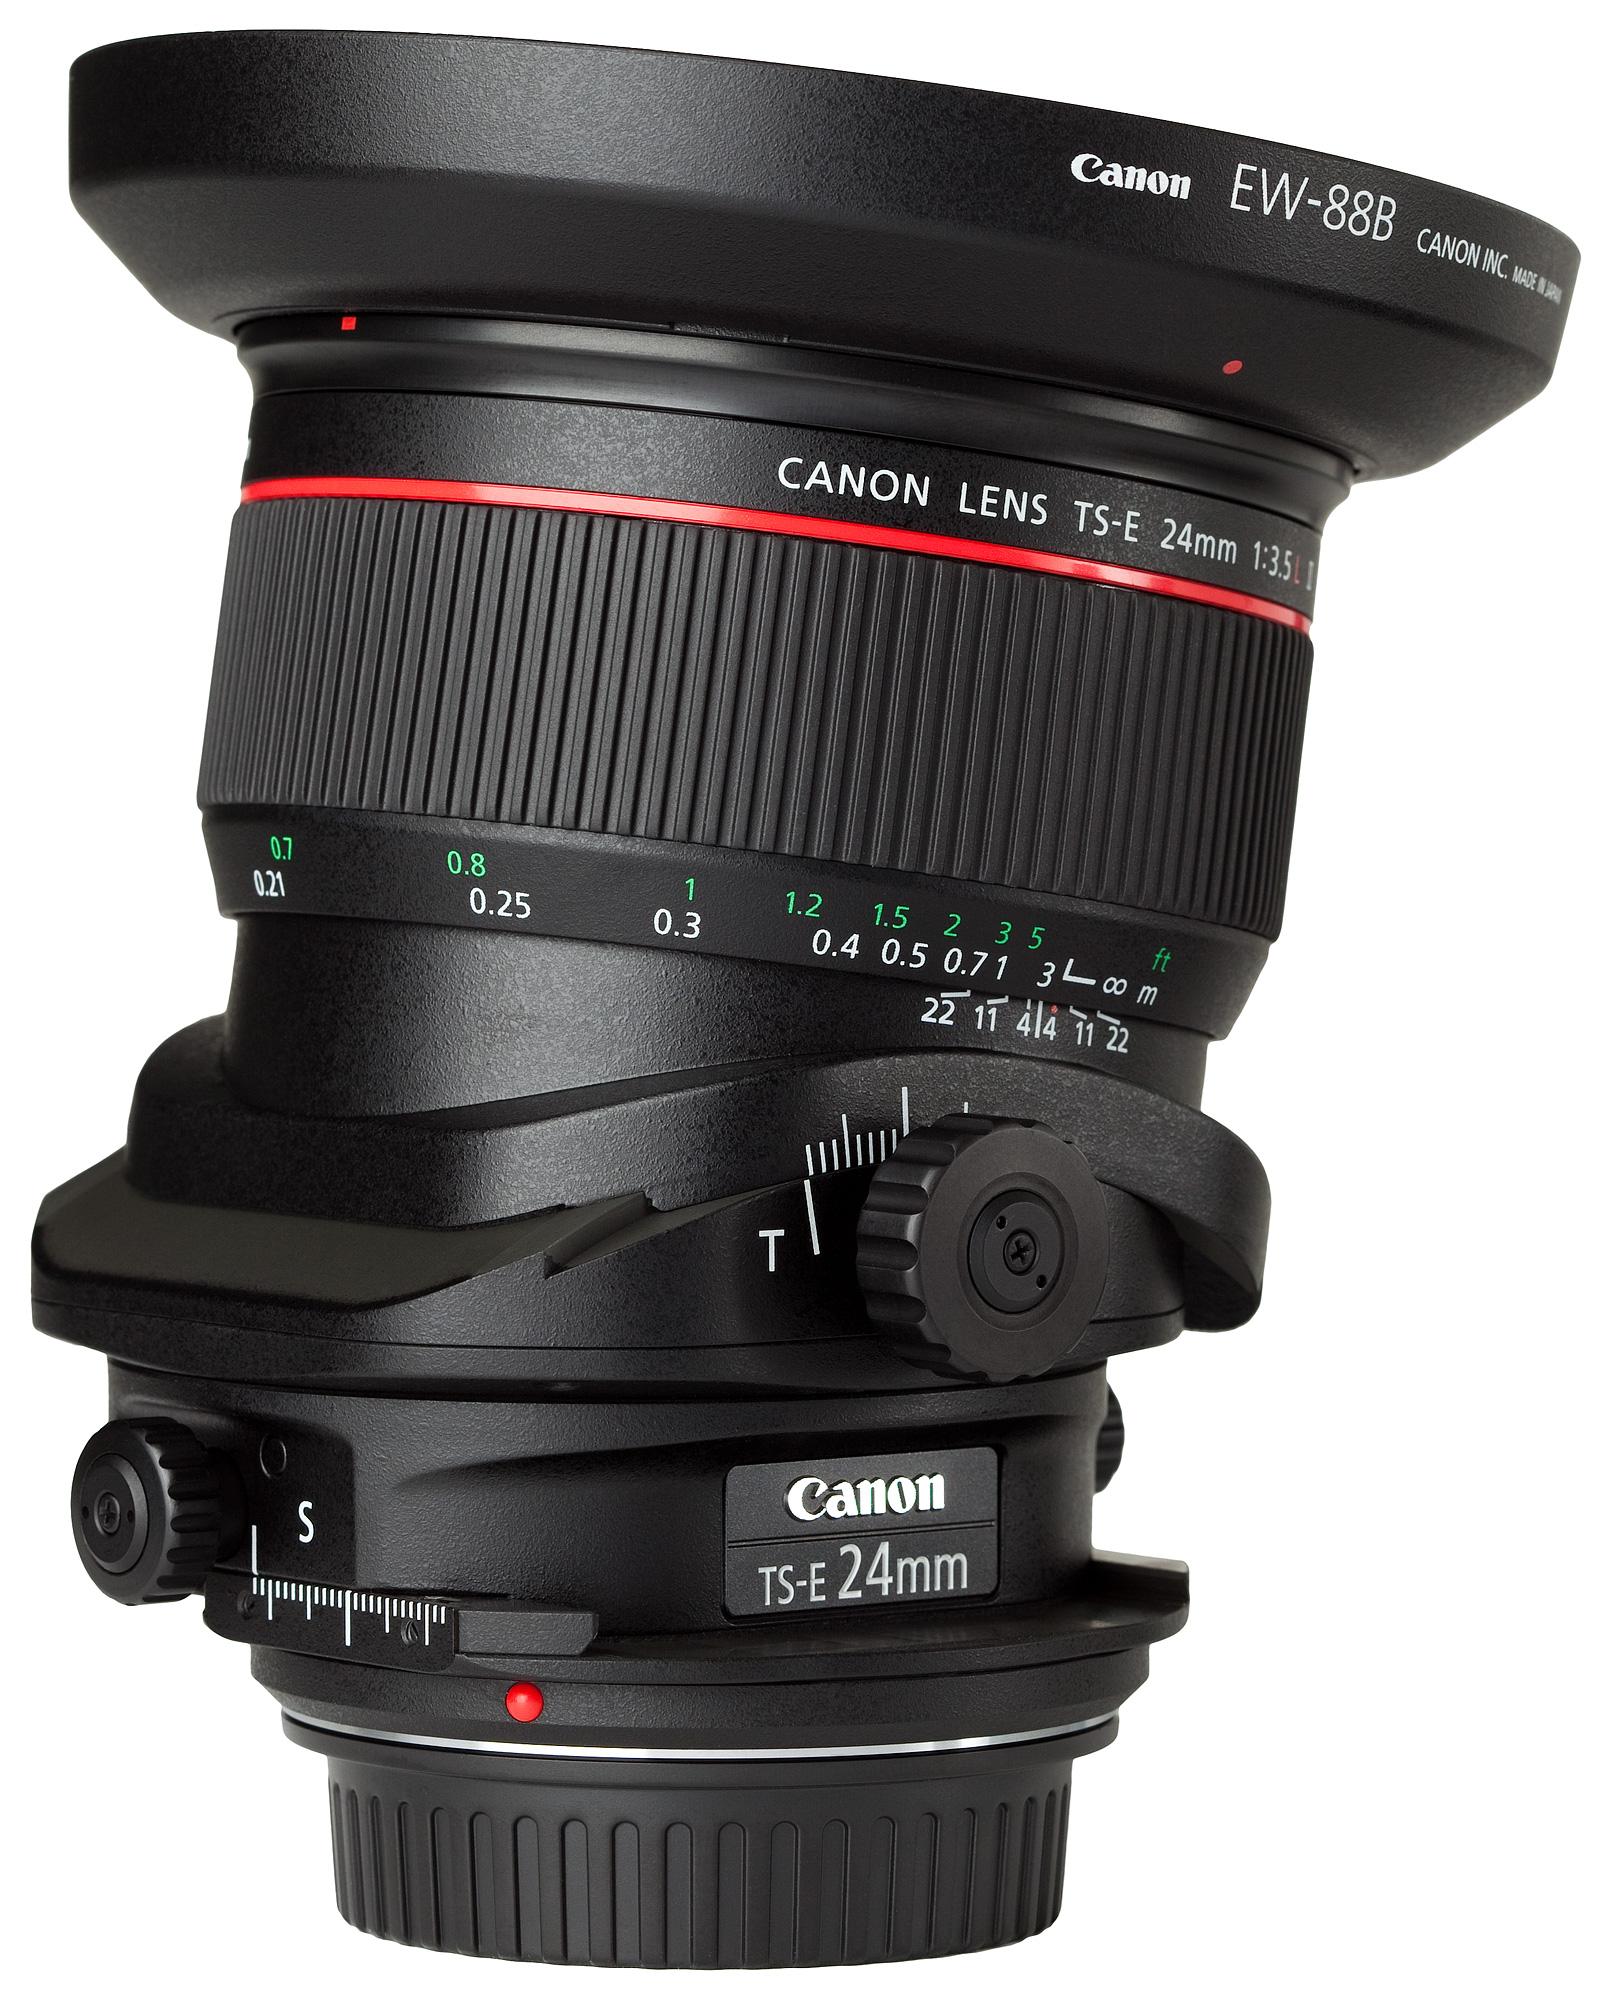 Tilt-Shift Objektiv von Canon. Quelle: Charles Lanteigne (CC BY-SA 3.0)